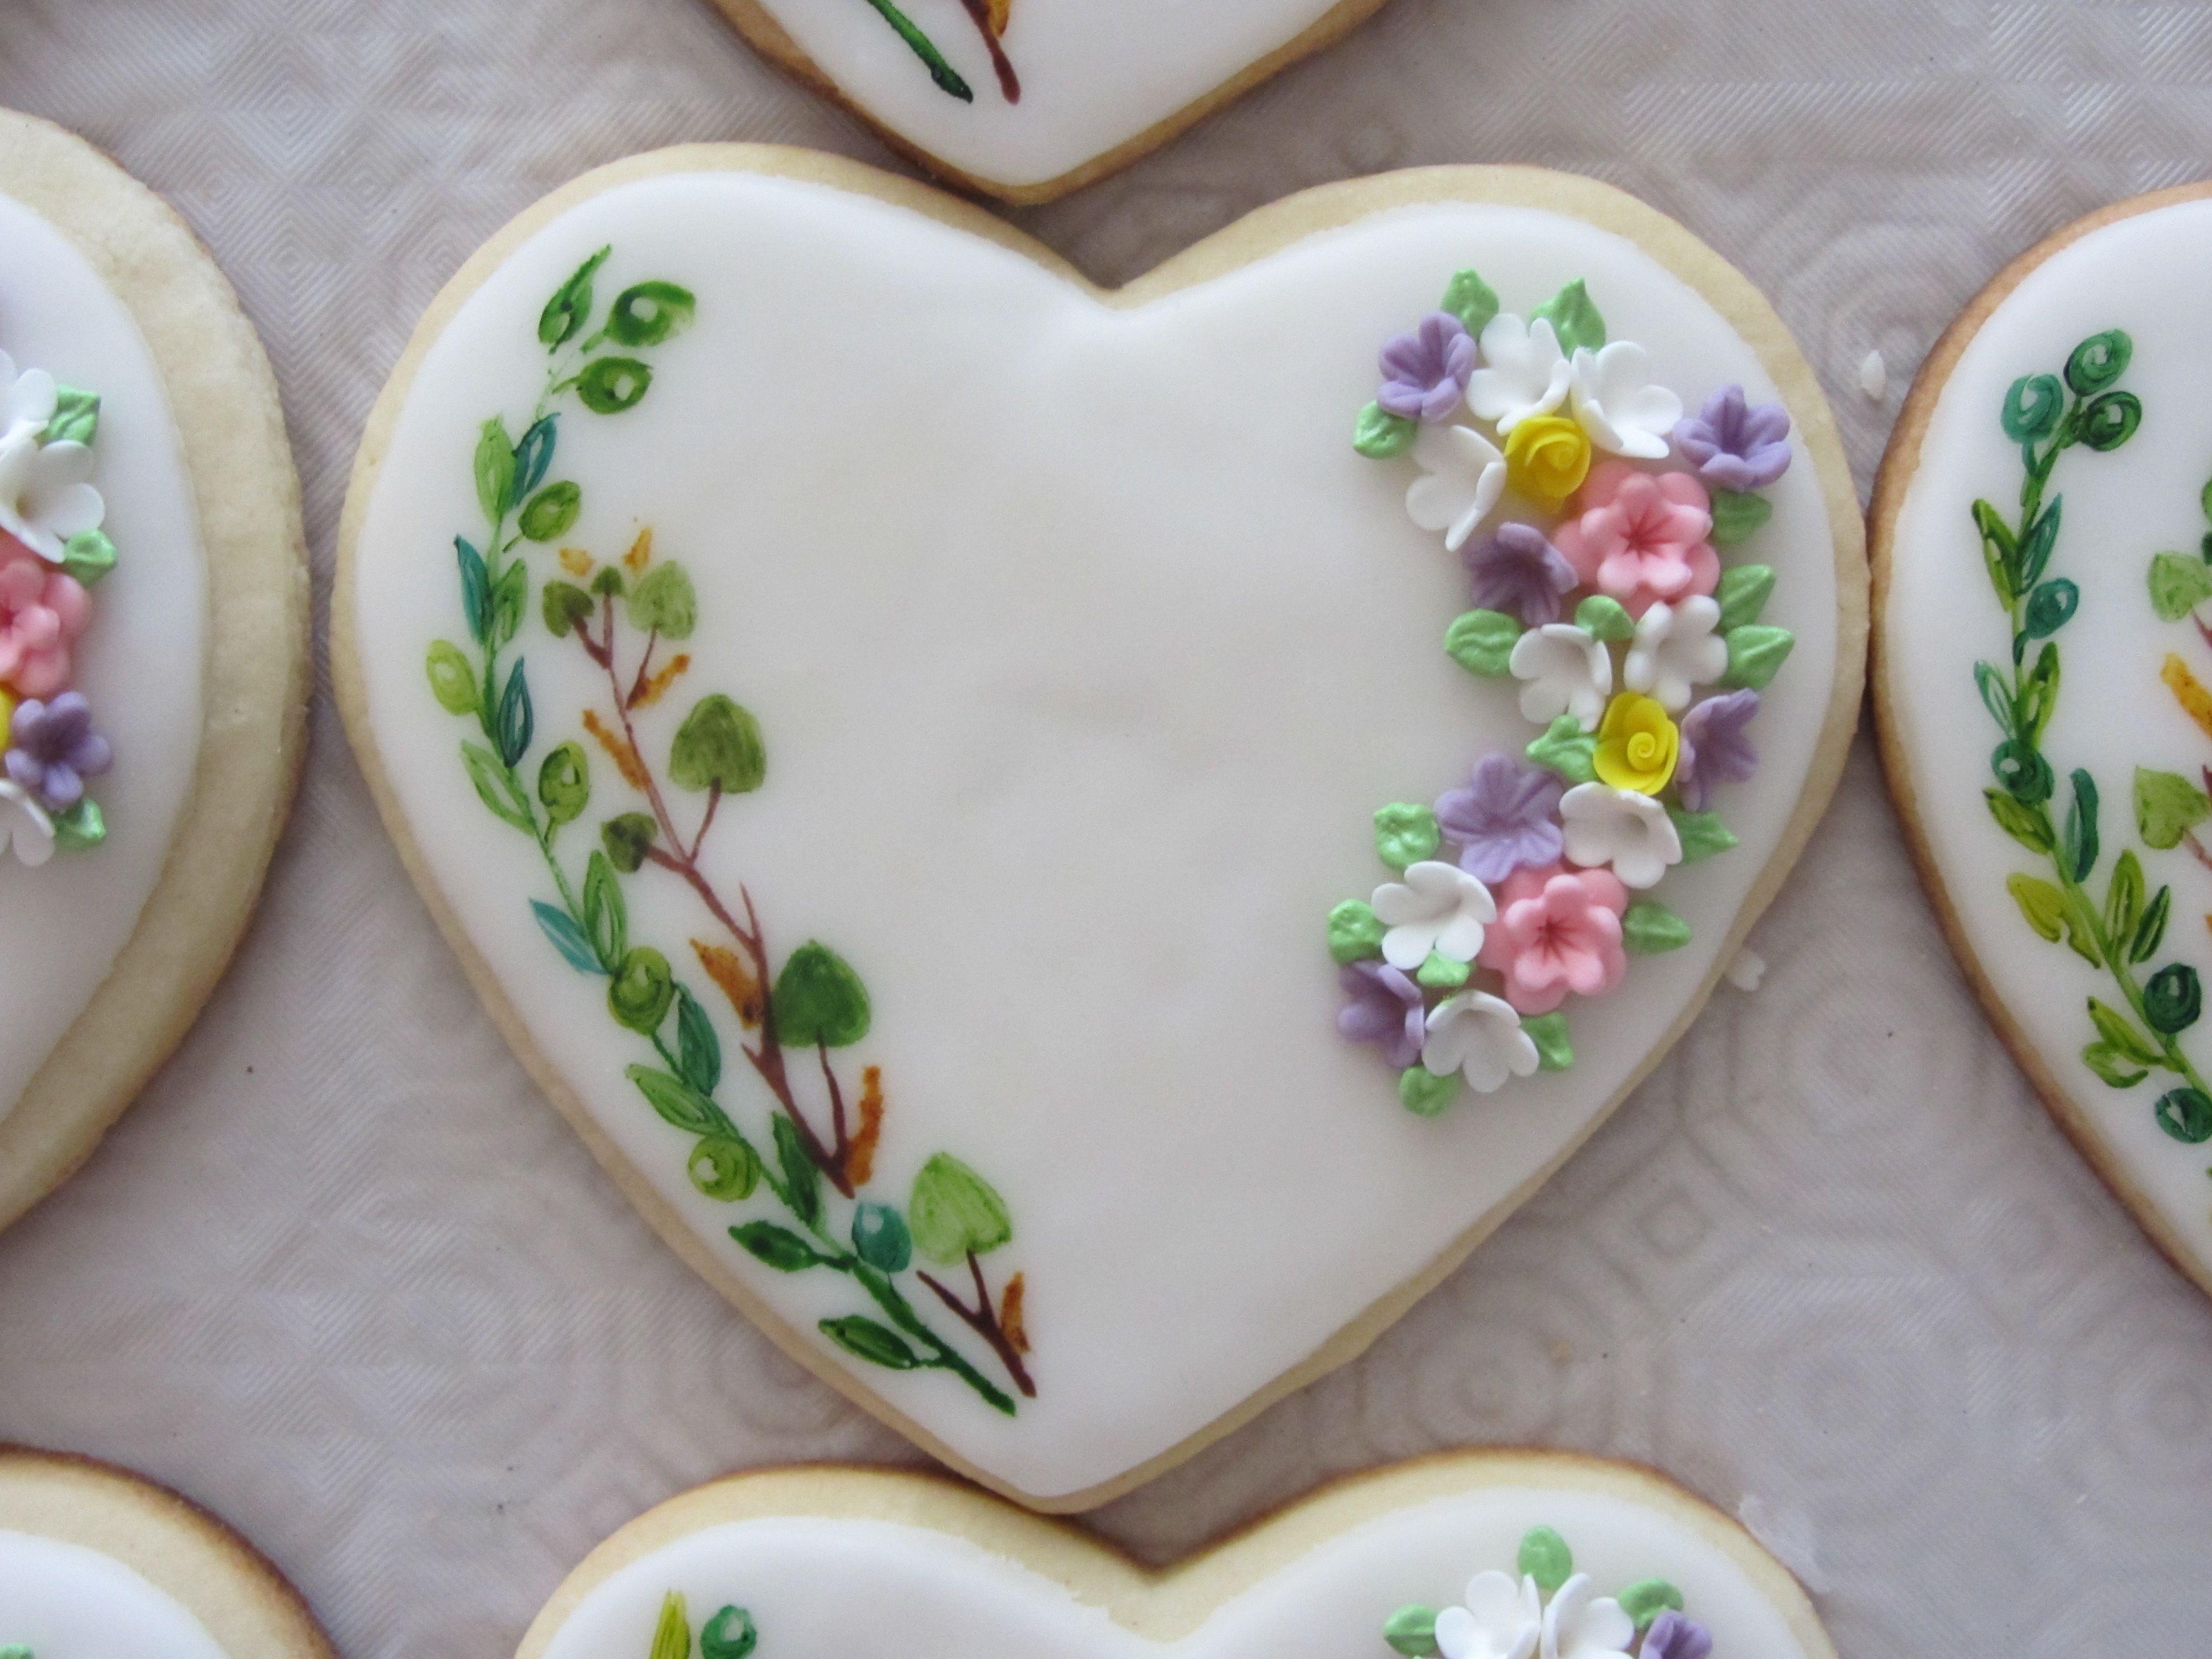 Bomboniere Matrimonio Pasta Di Zucchero.Biscotti Decorati In Pasta Di Zucchero Per Bomboniere Da